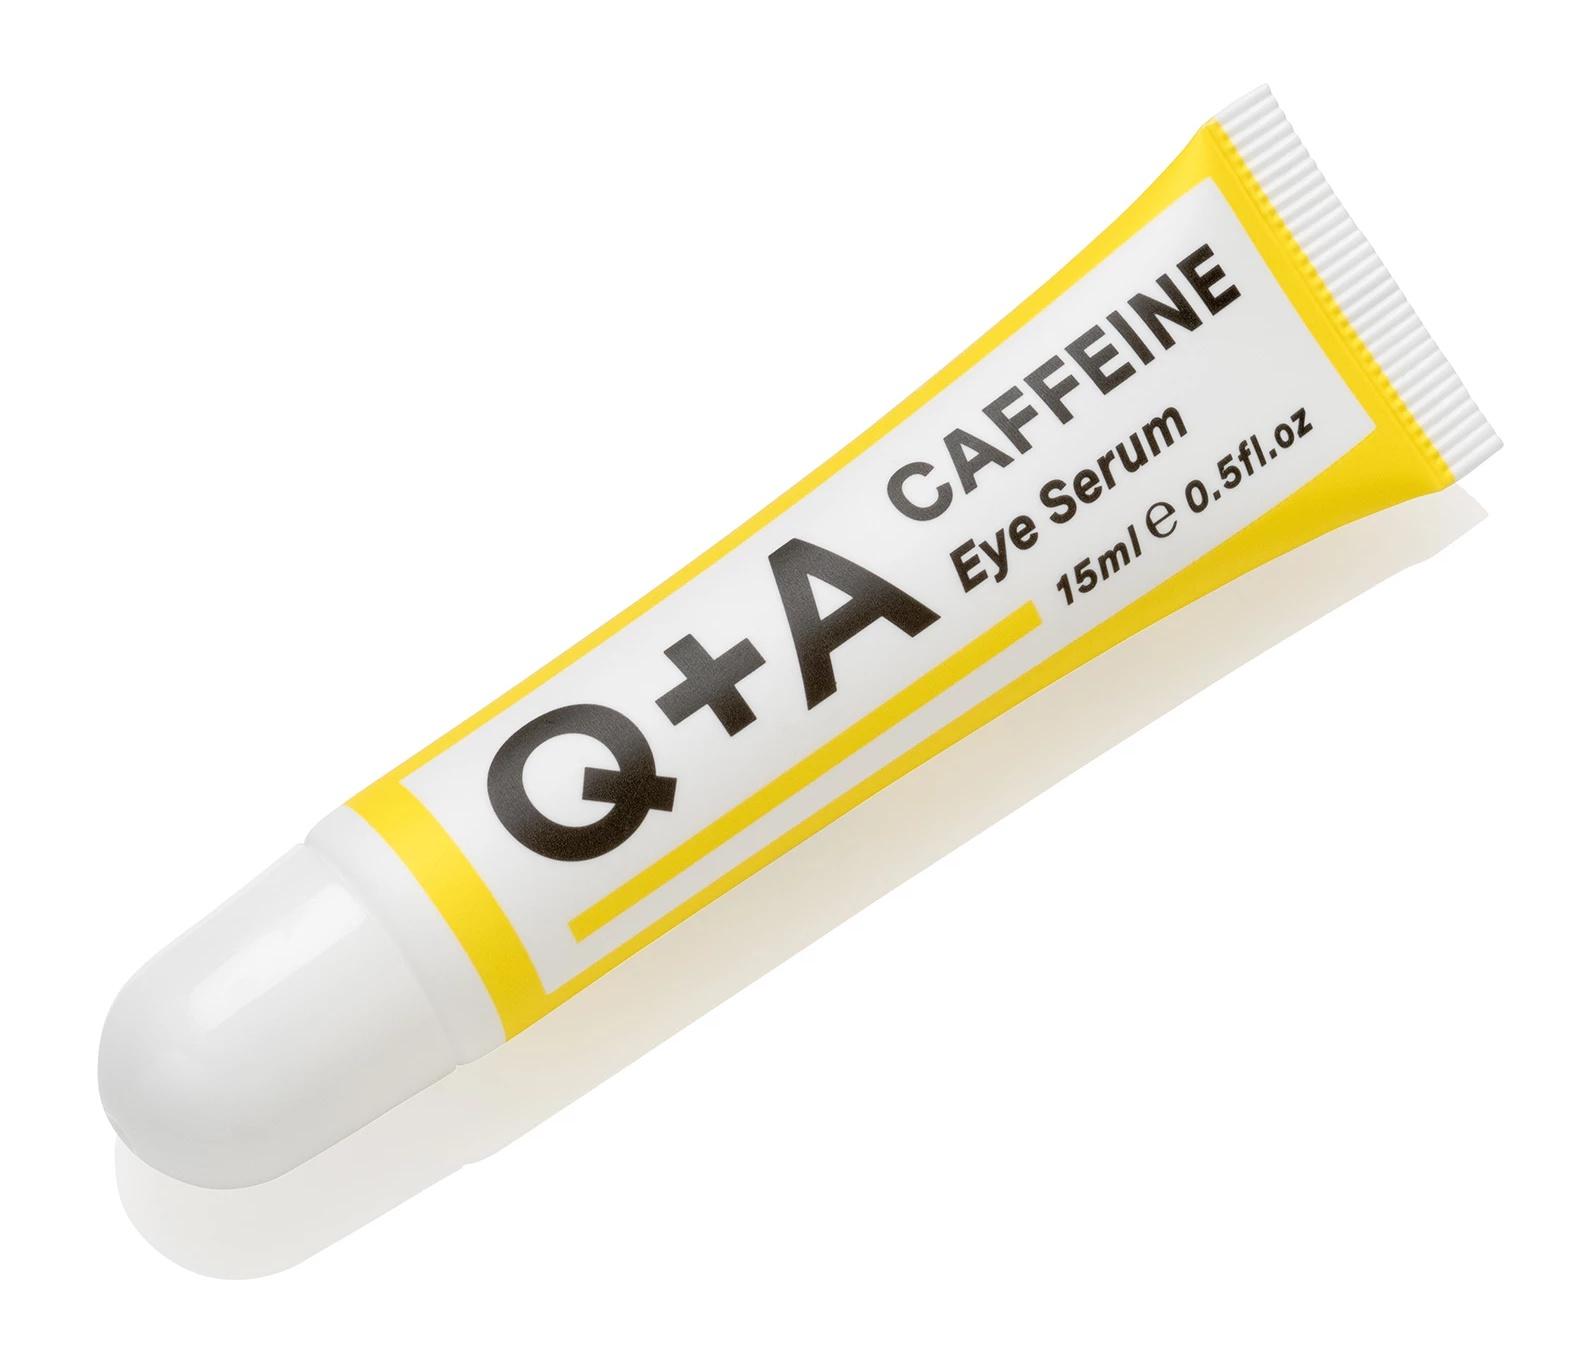 Q+A Caffeine Eye Serum